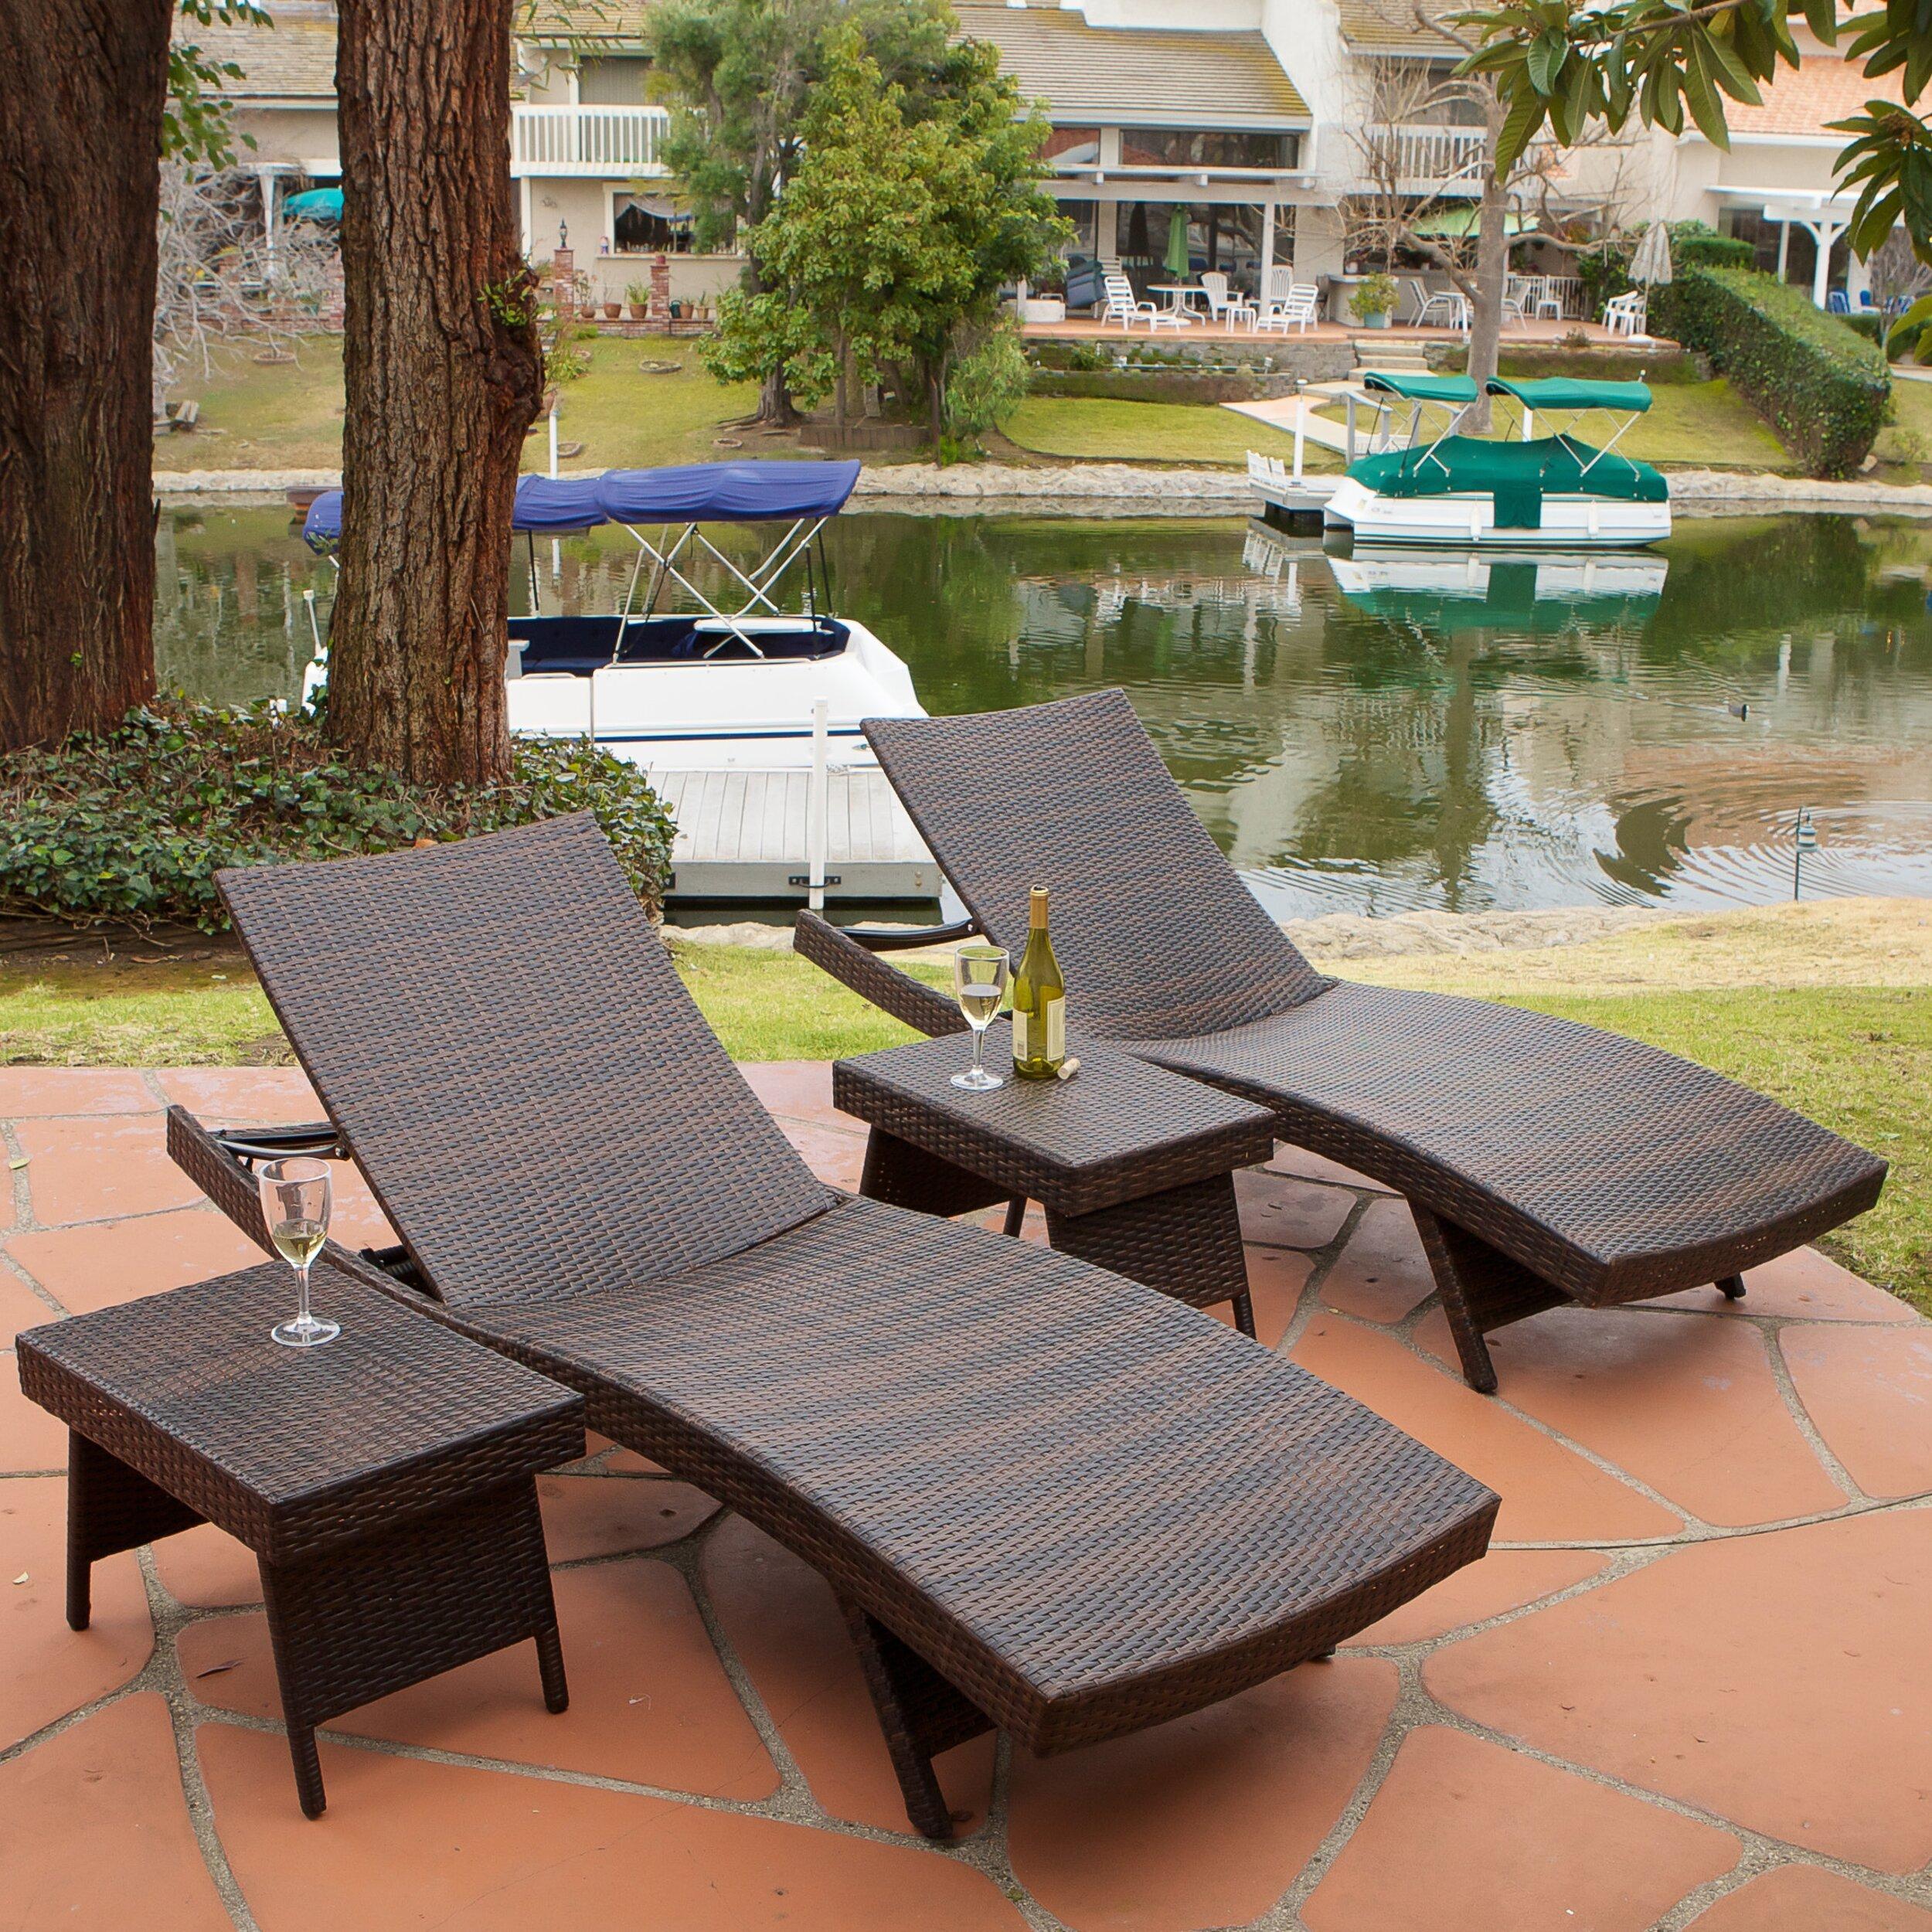 Brayden studio gadbois adjustable chaise lounge reviews for Muebles para piscina